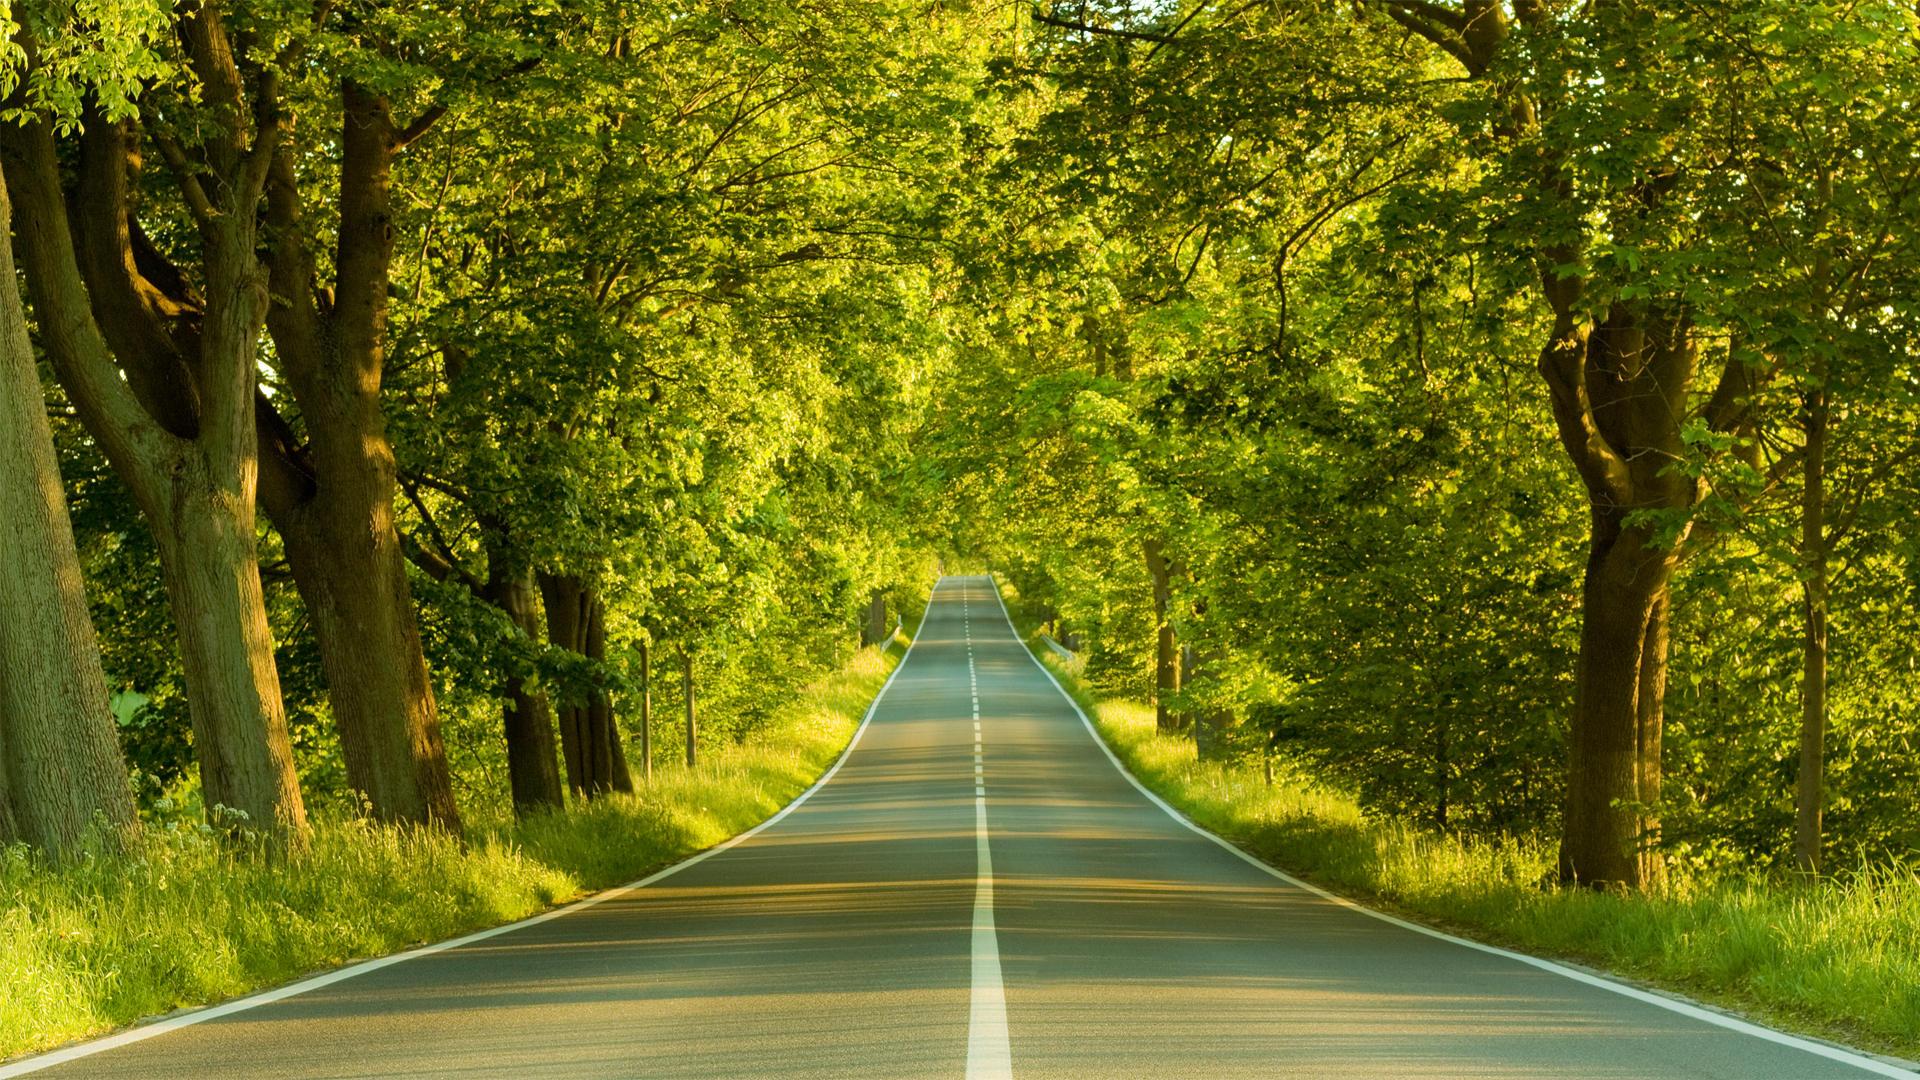 Greenery Road Nature Wallpaper Wallpaper | WallpaperLepi